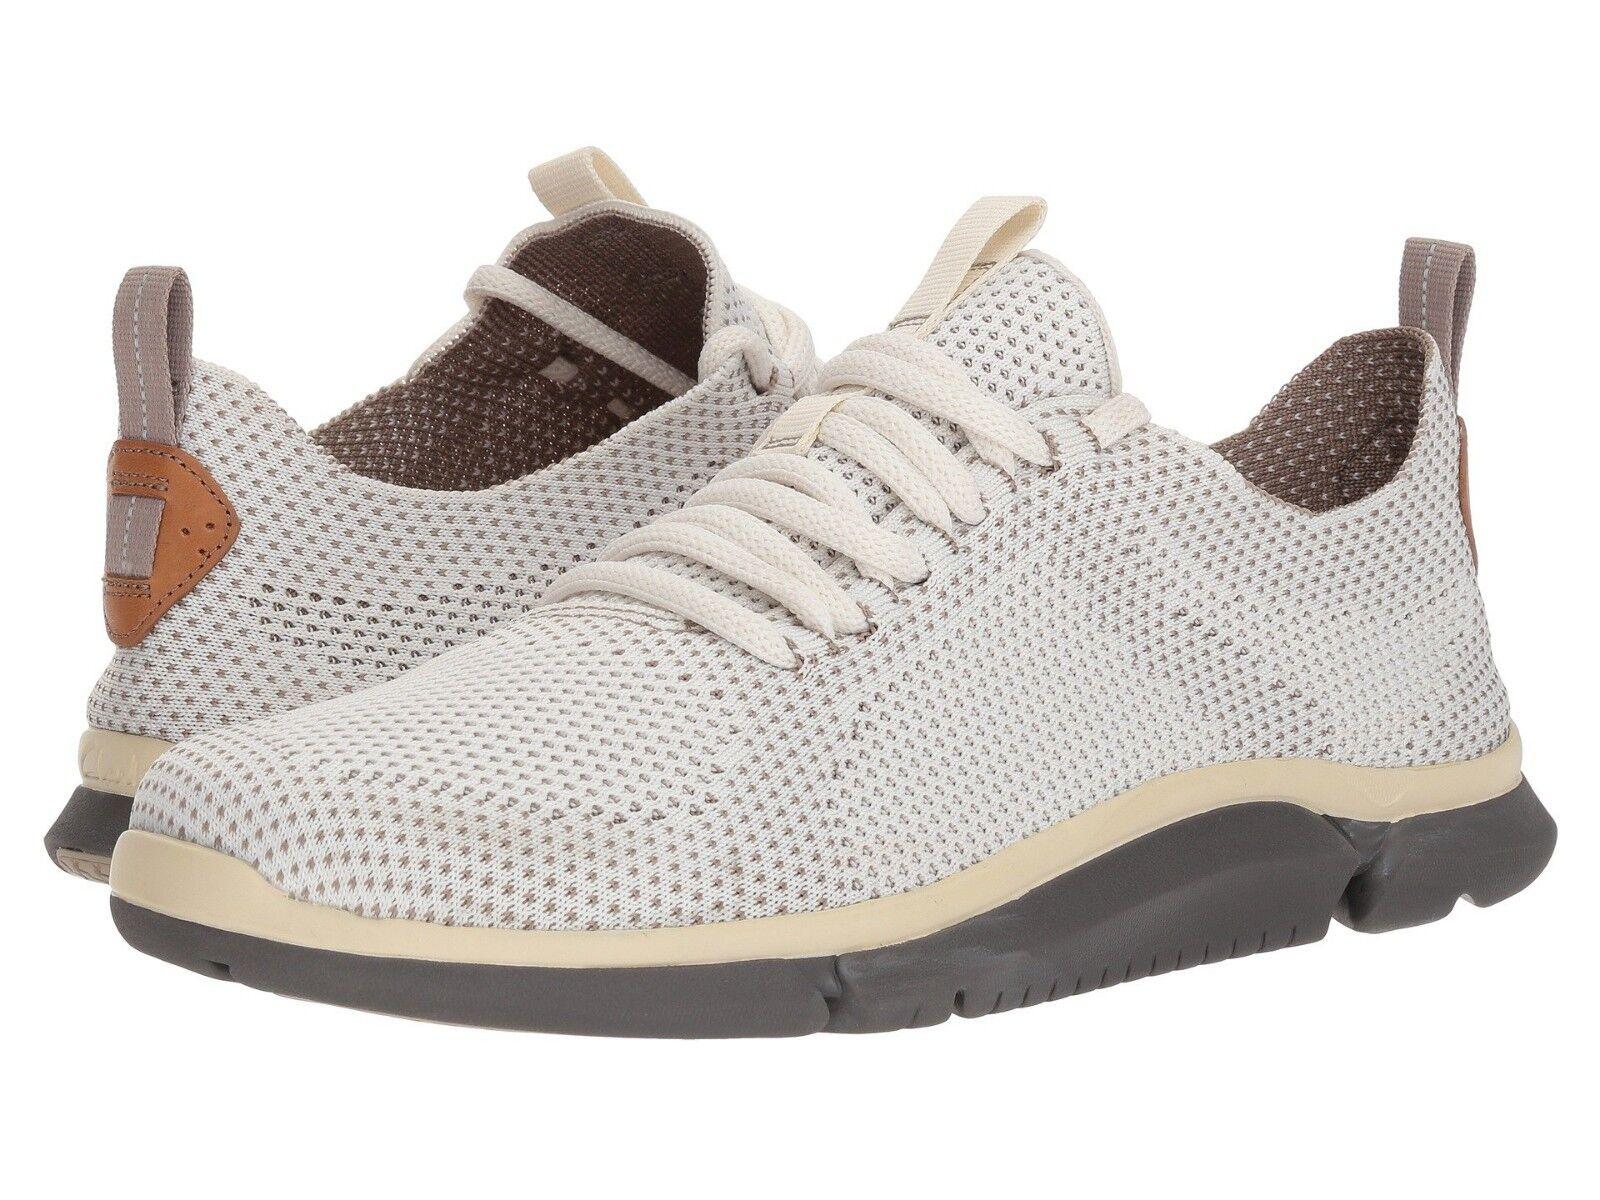 Men's shoes Clarks Triken Run Lace Up Active Sneaker 30967 White New